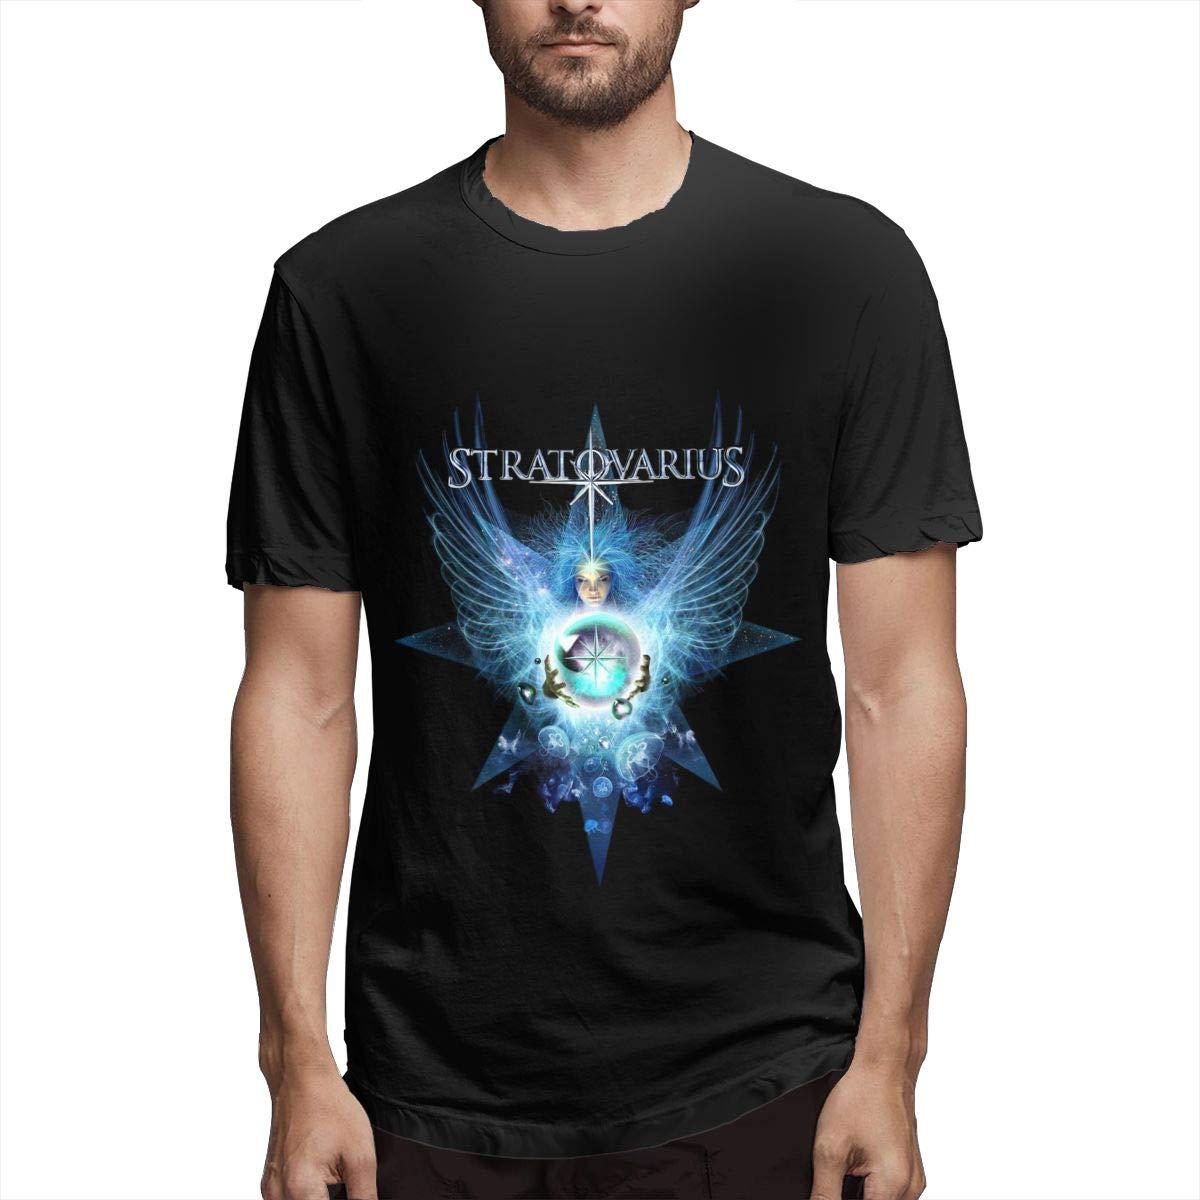 Lihehen S Stratovarius Fashion Leisure Round Neck T Shirts